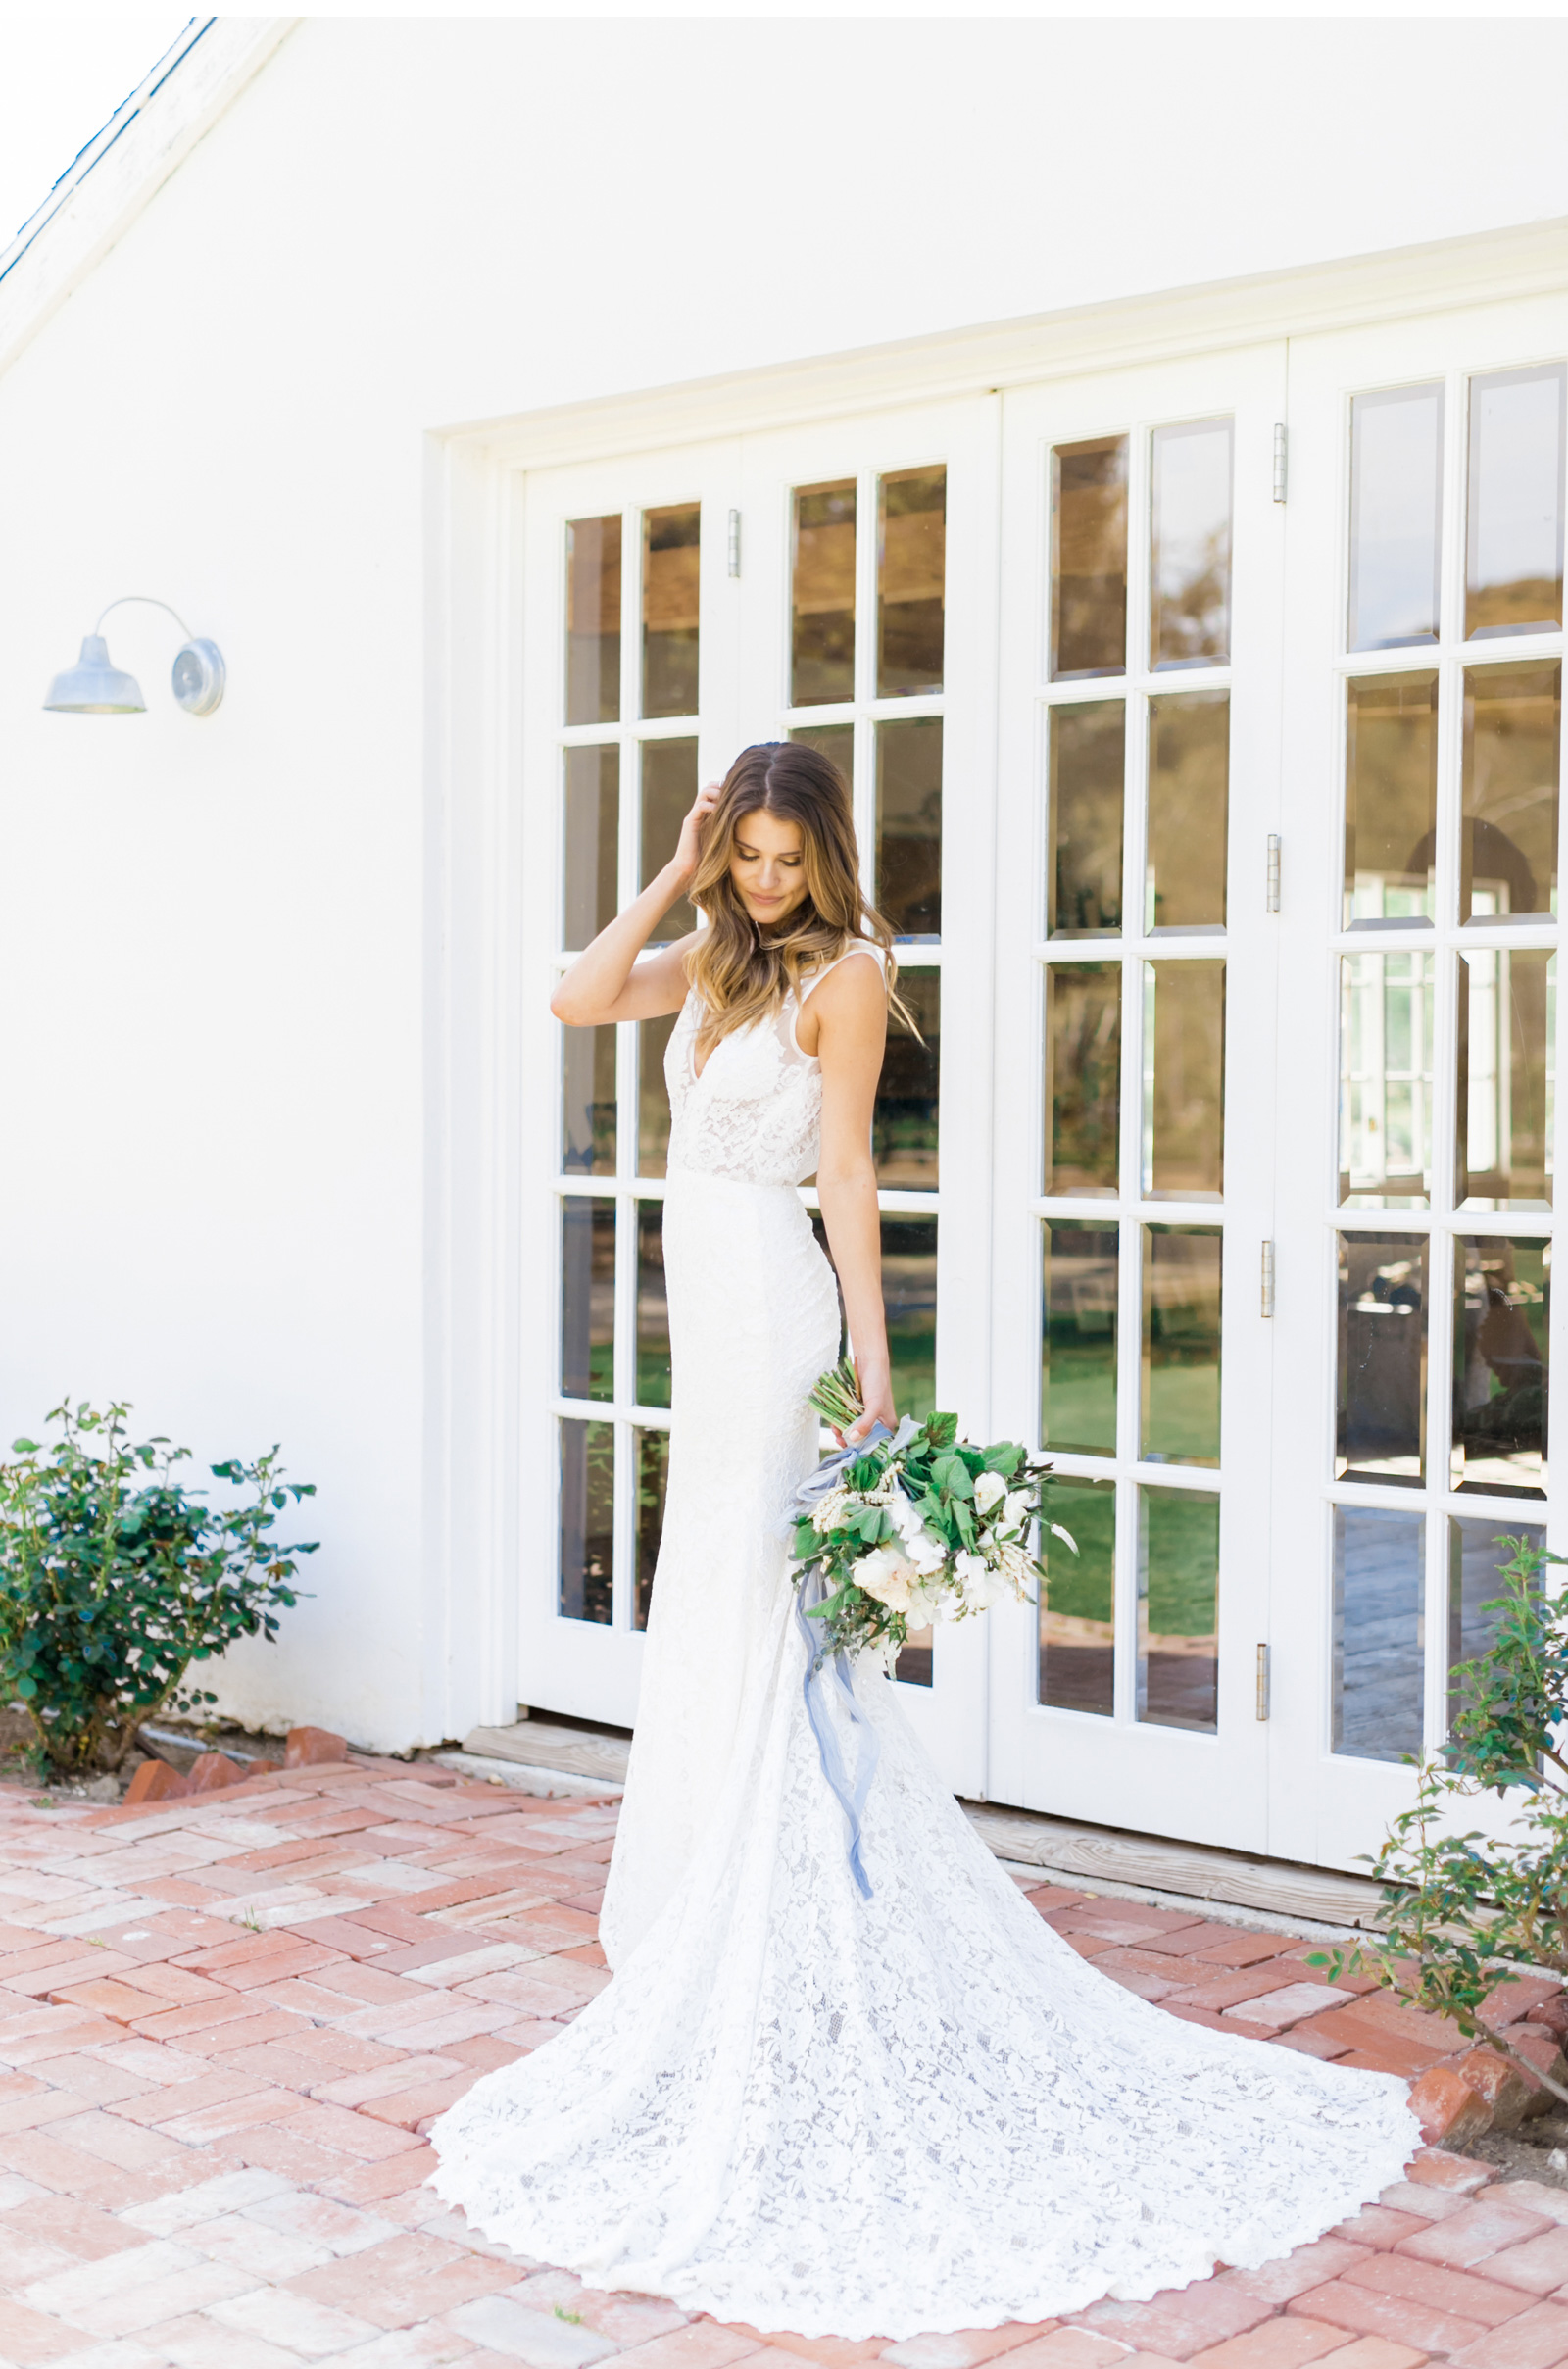 Malibu-Wedding-Photographer-Saddlerock-Ranch-Triunfo-Creek-Style-Me-Pretty_03.jpg